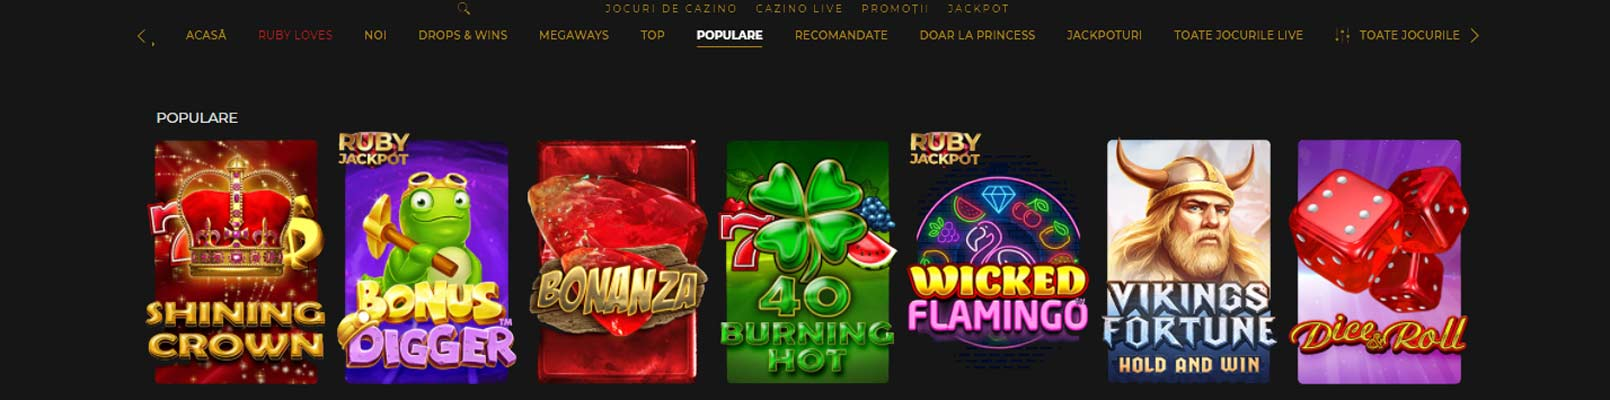 jocuri princess casino online